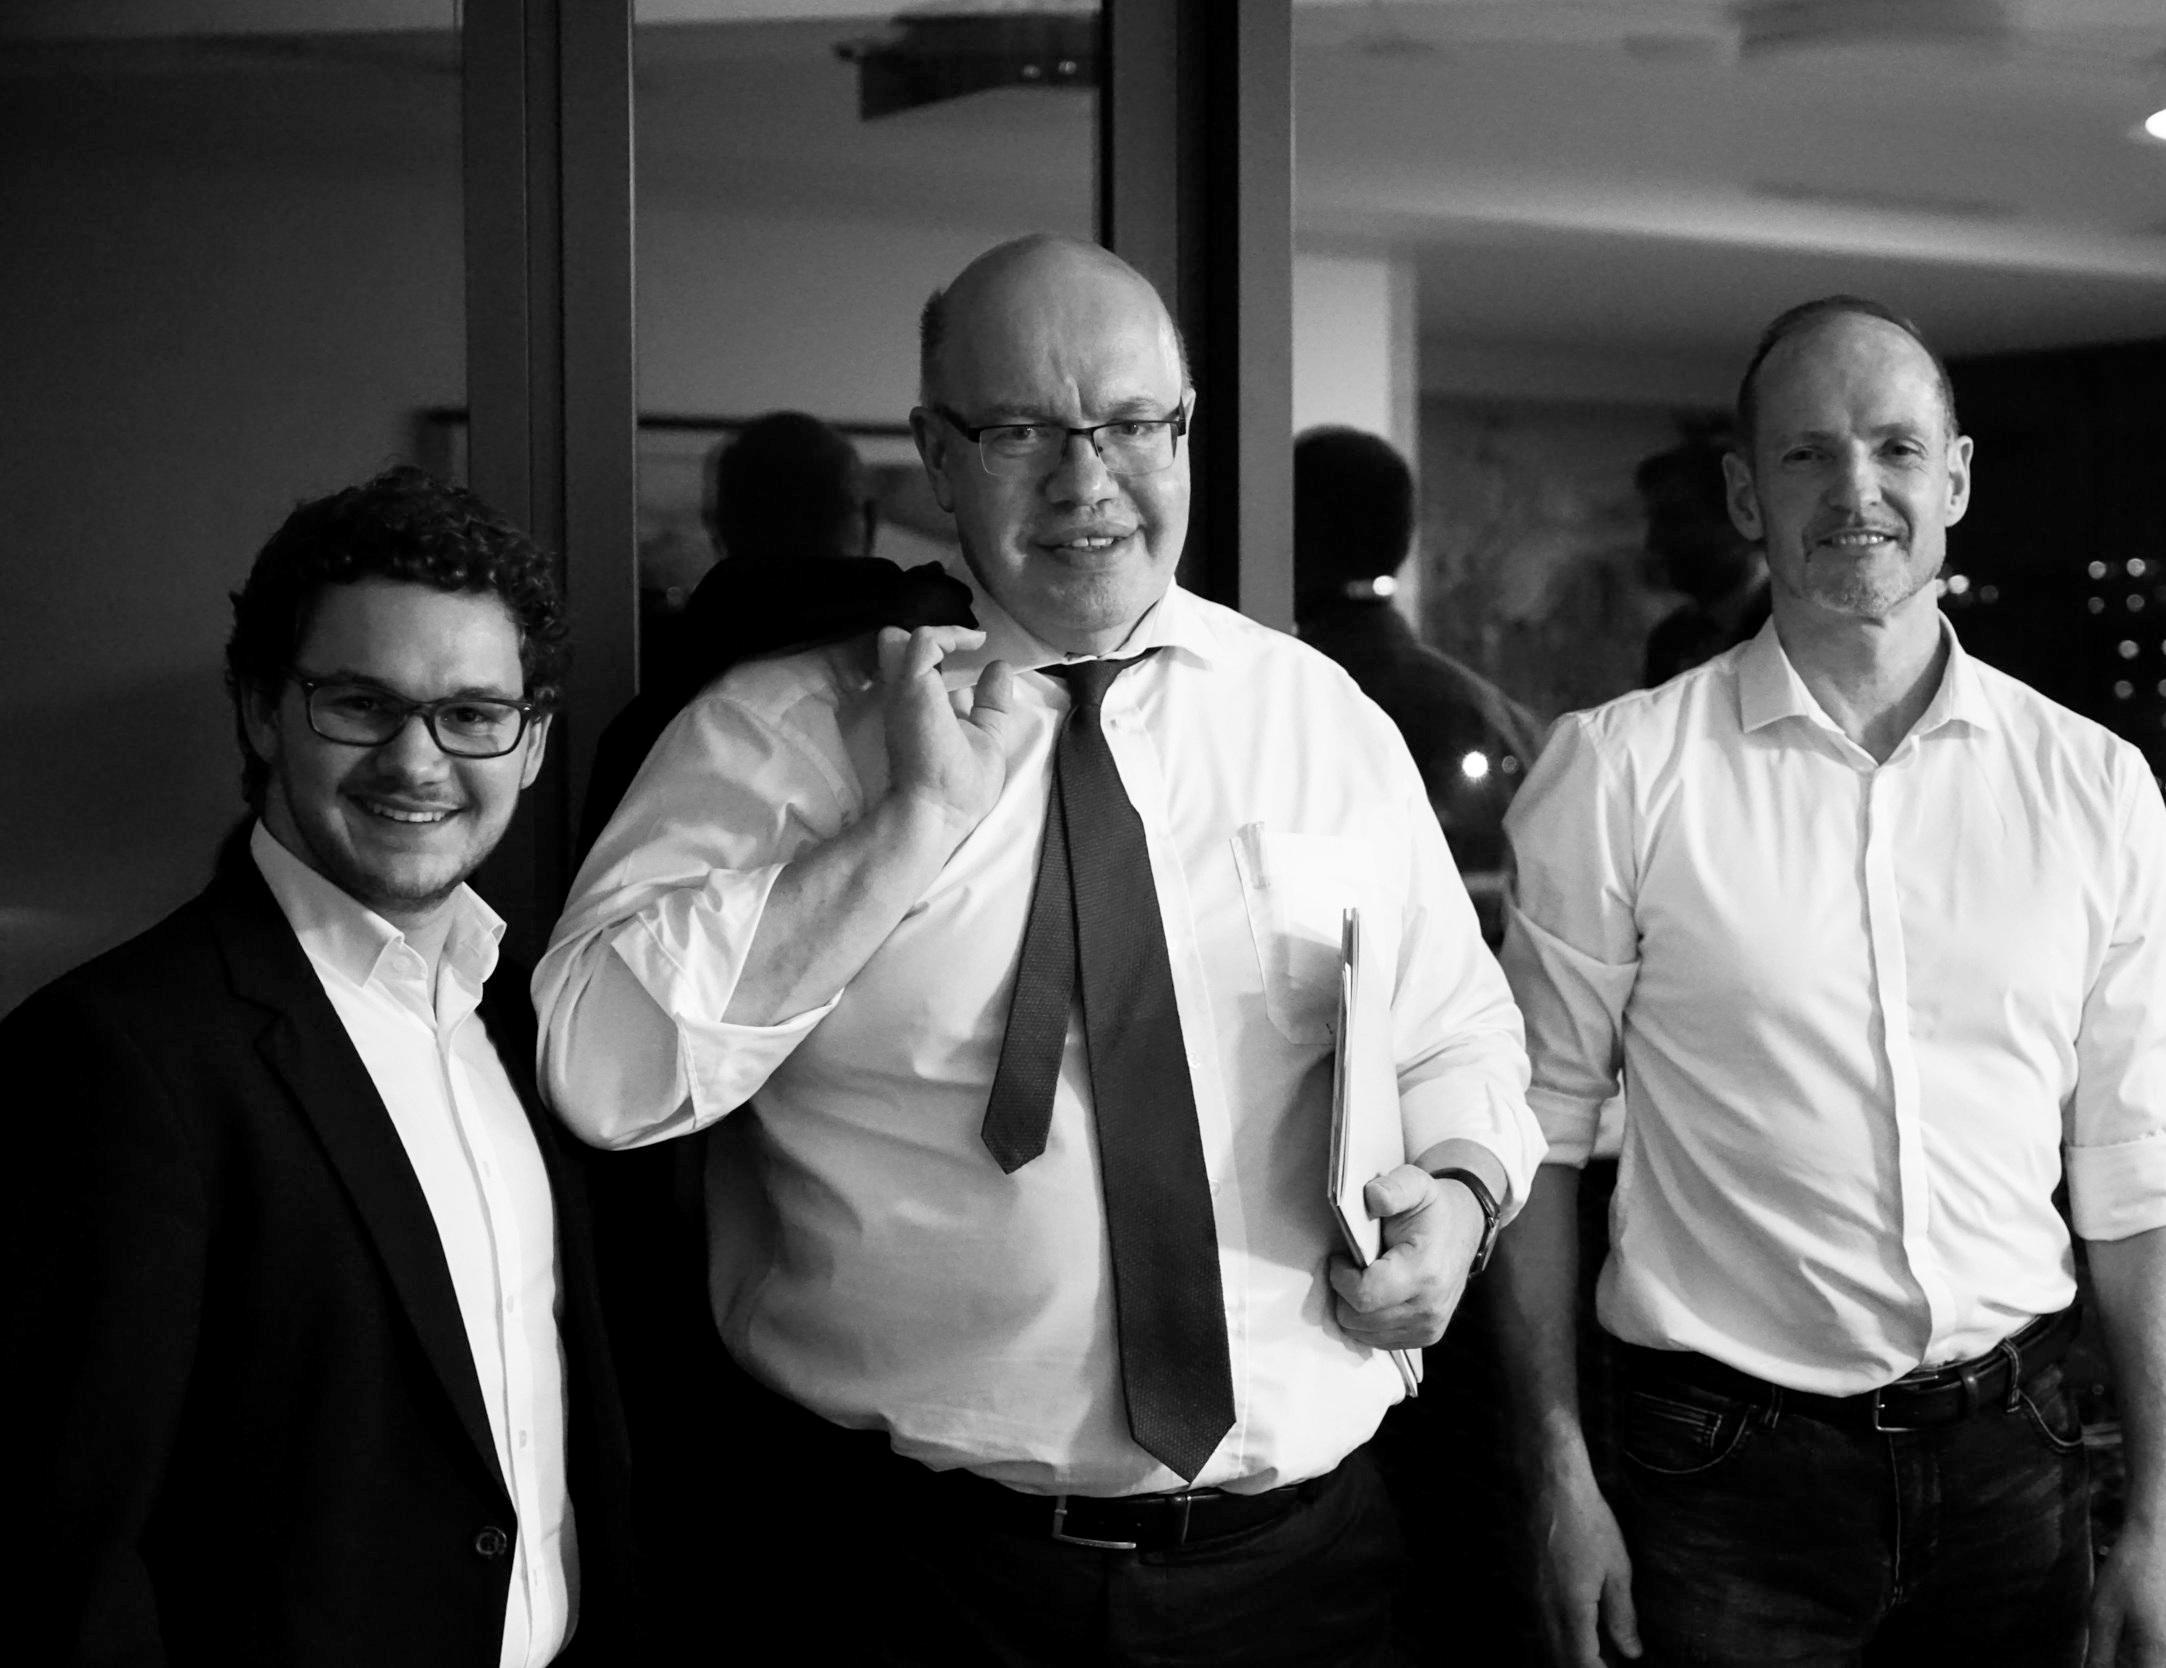 Carbonaut Michael Sernatinger, BM Peter Altmaier, Carbonaut Torsten Becker